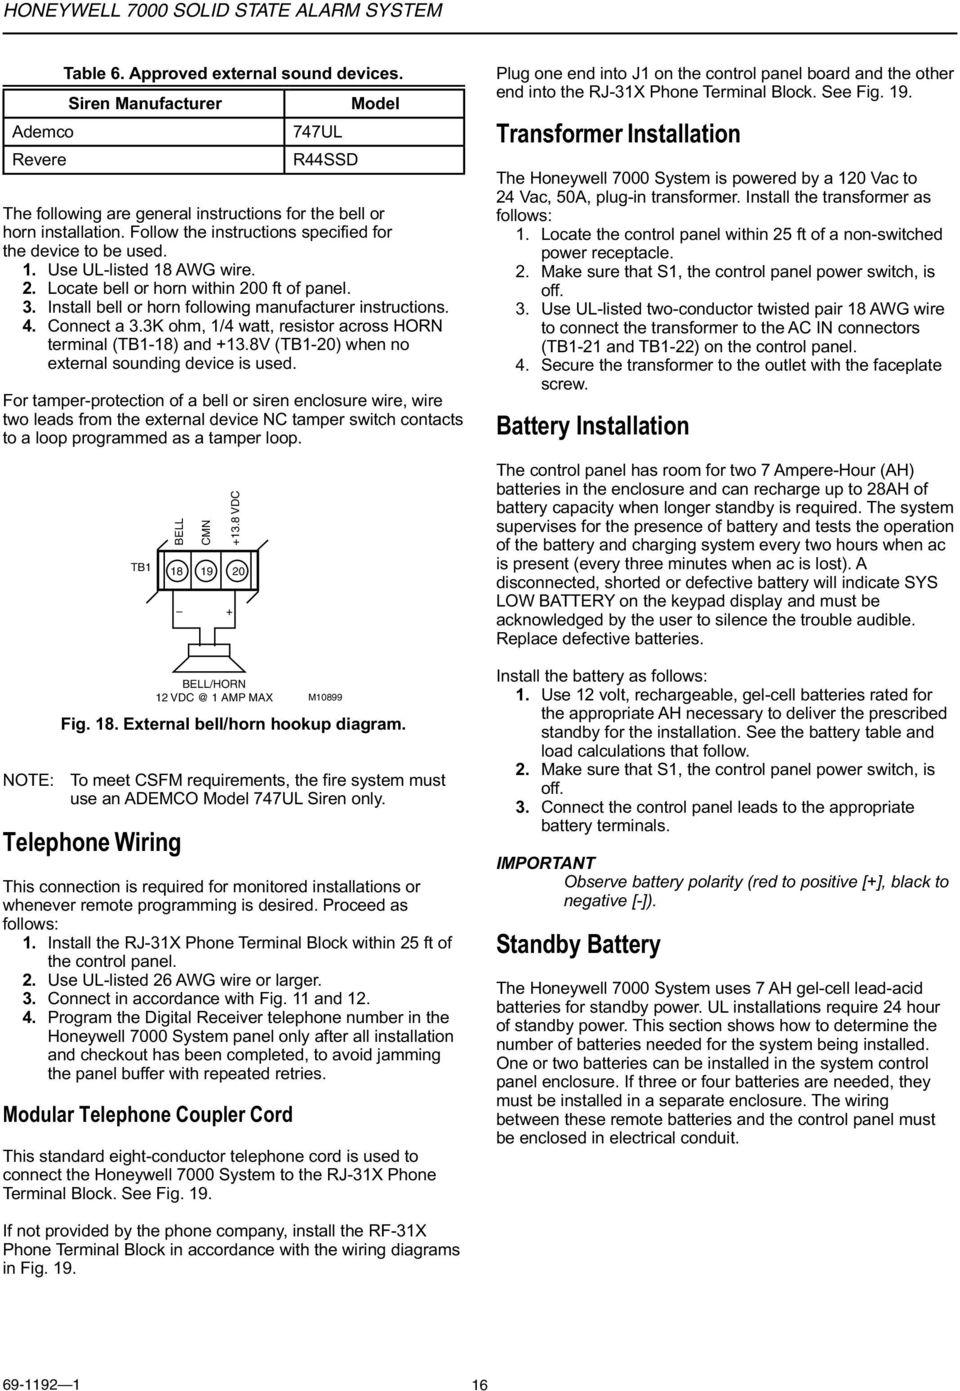 medium resolution of connect a 3 3k ohm 4 watt resistor across horn terminal tb